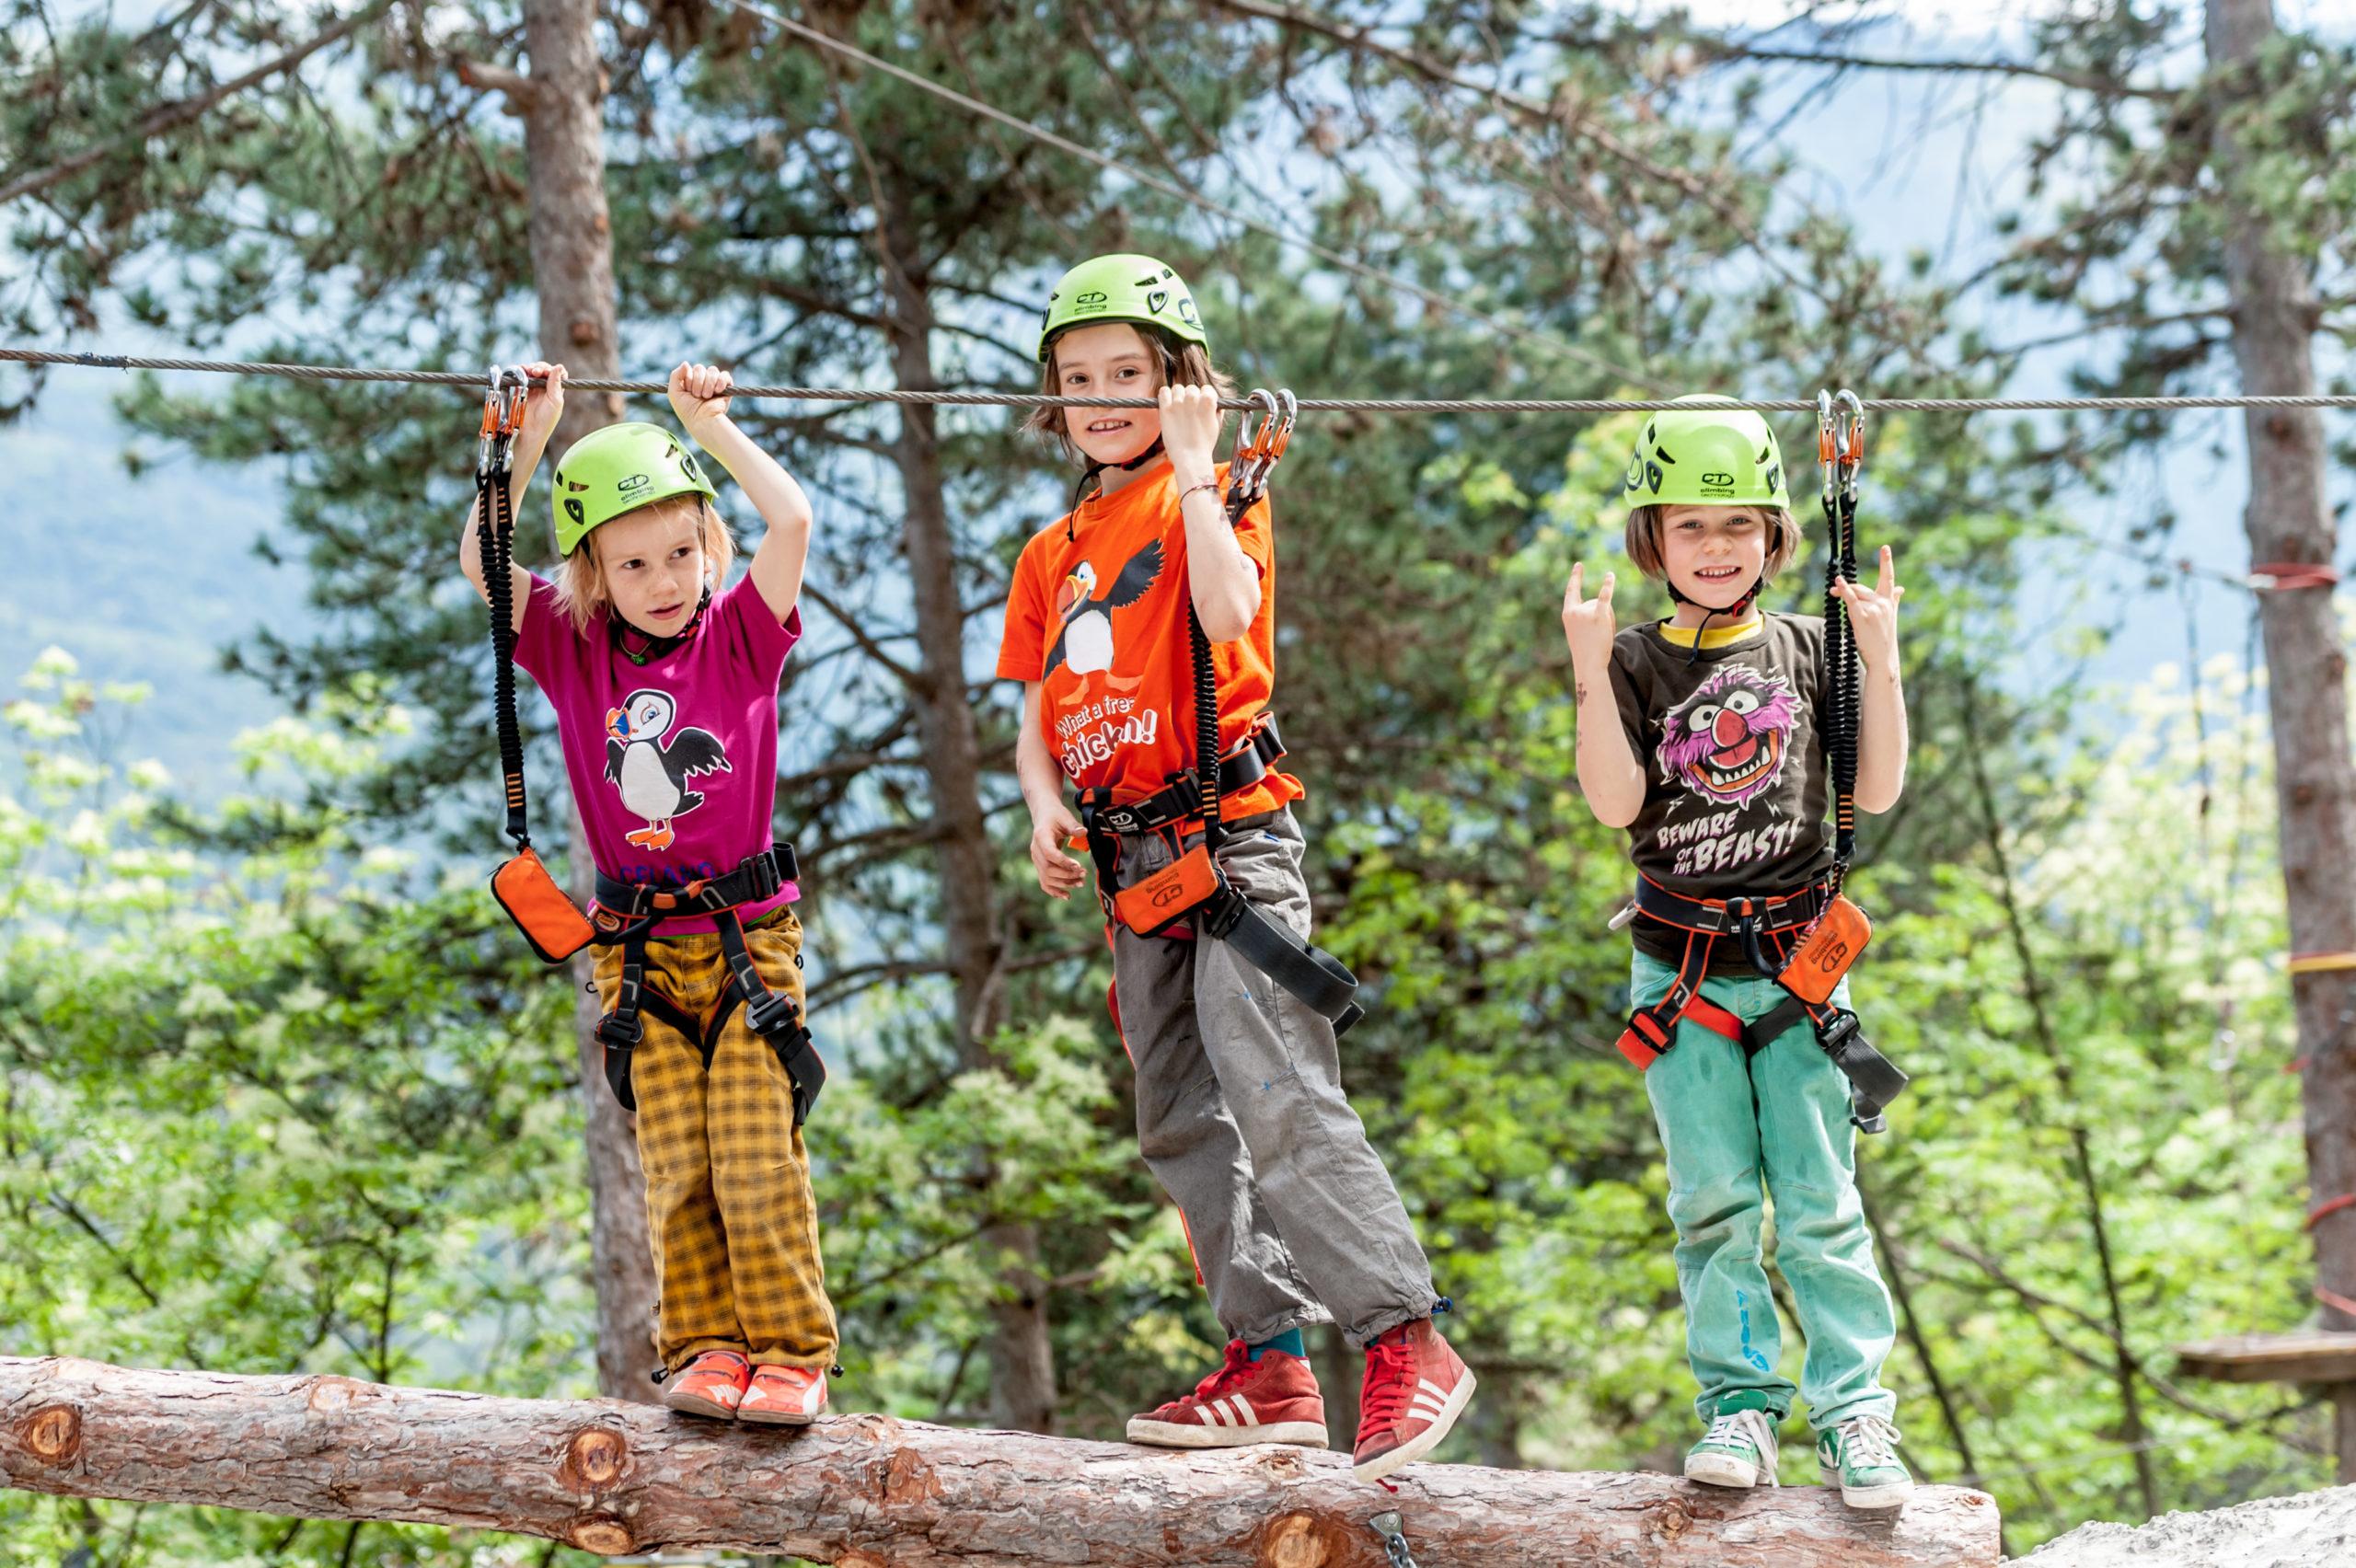 Flik l'imbracatura per bambini di Climbing Technology